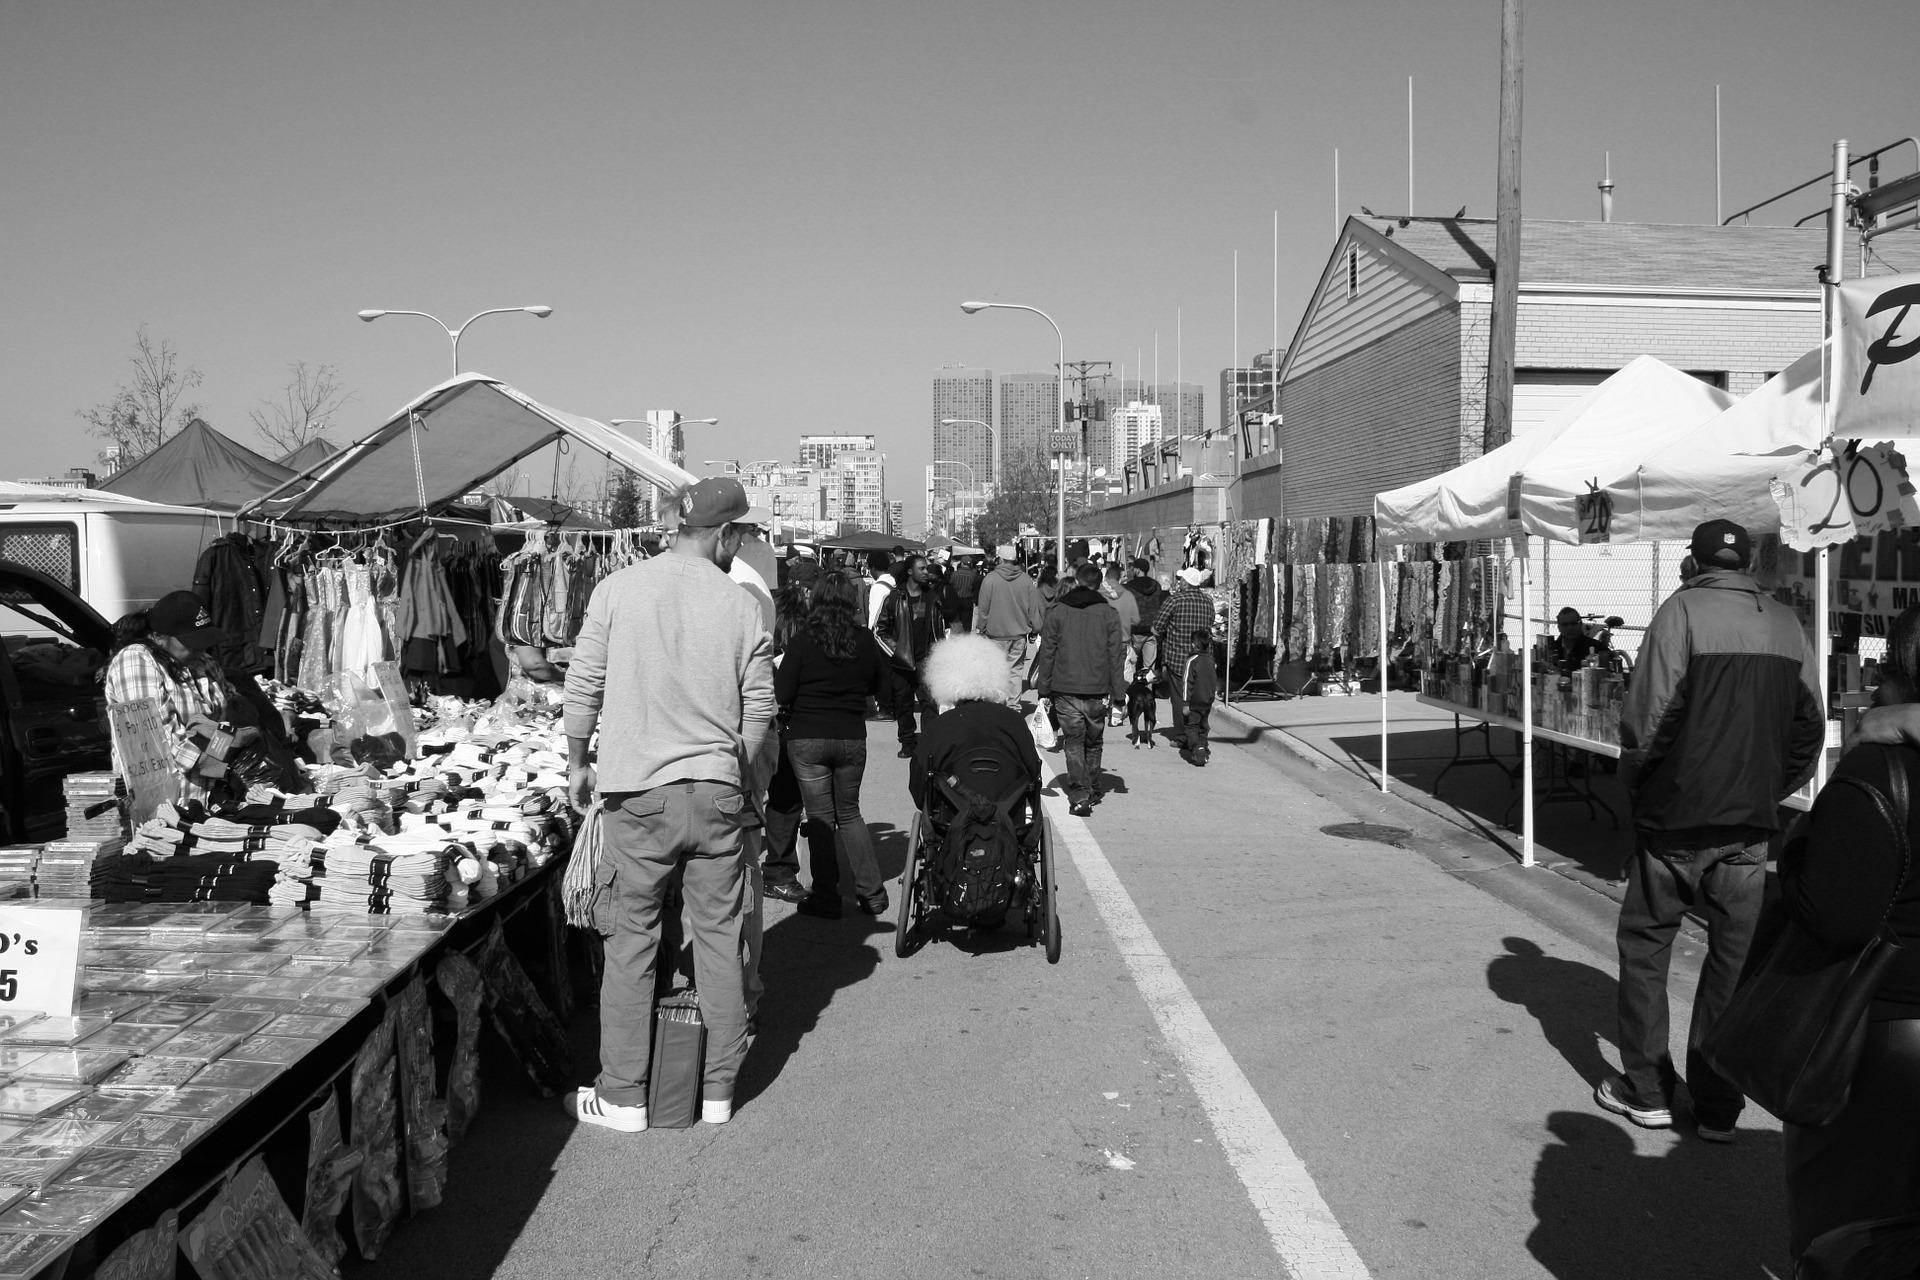 maxwell-street-market-62353_1920.jpg